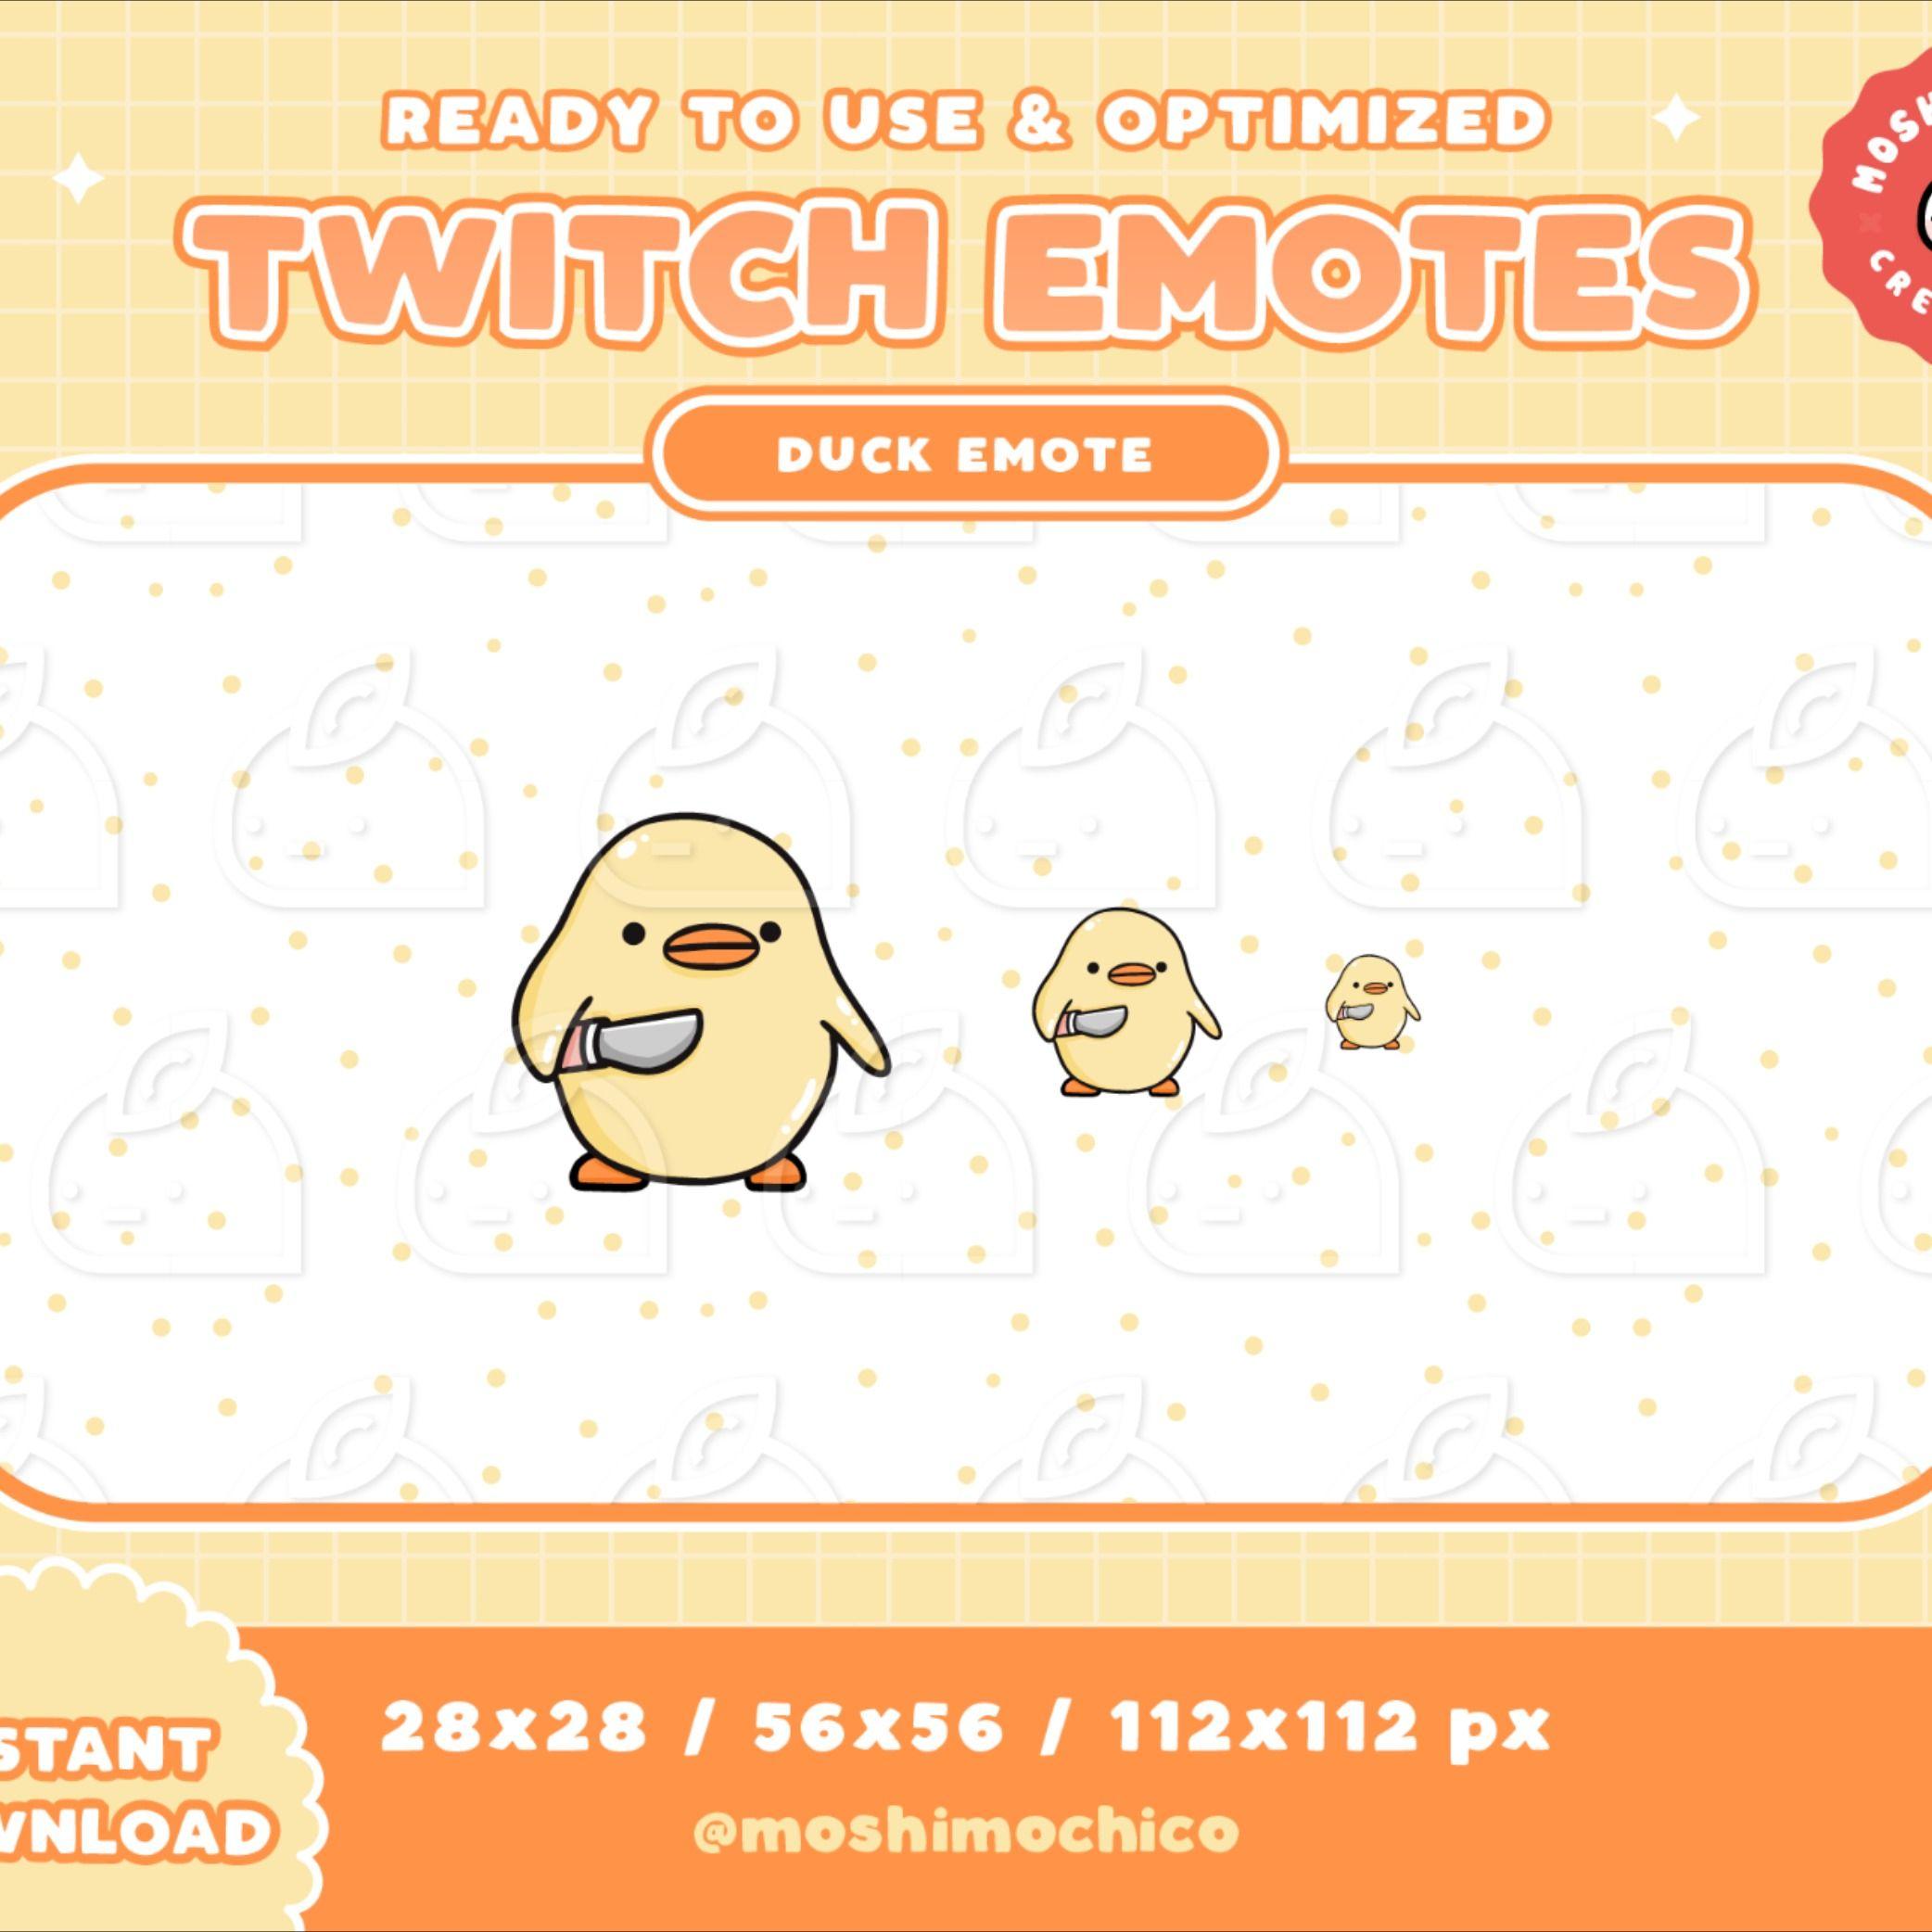 1x twitch emote yellow meme duck emoji streamer pun